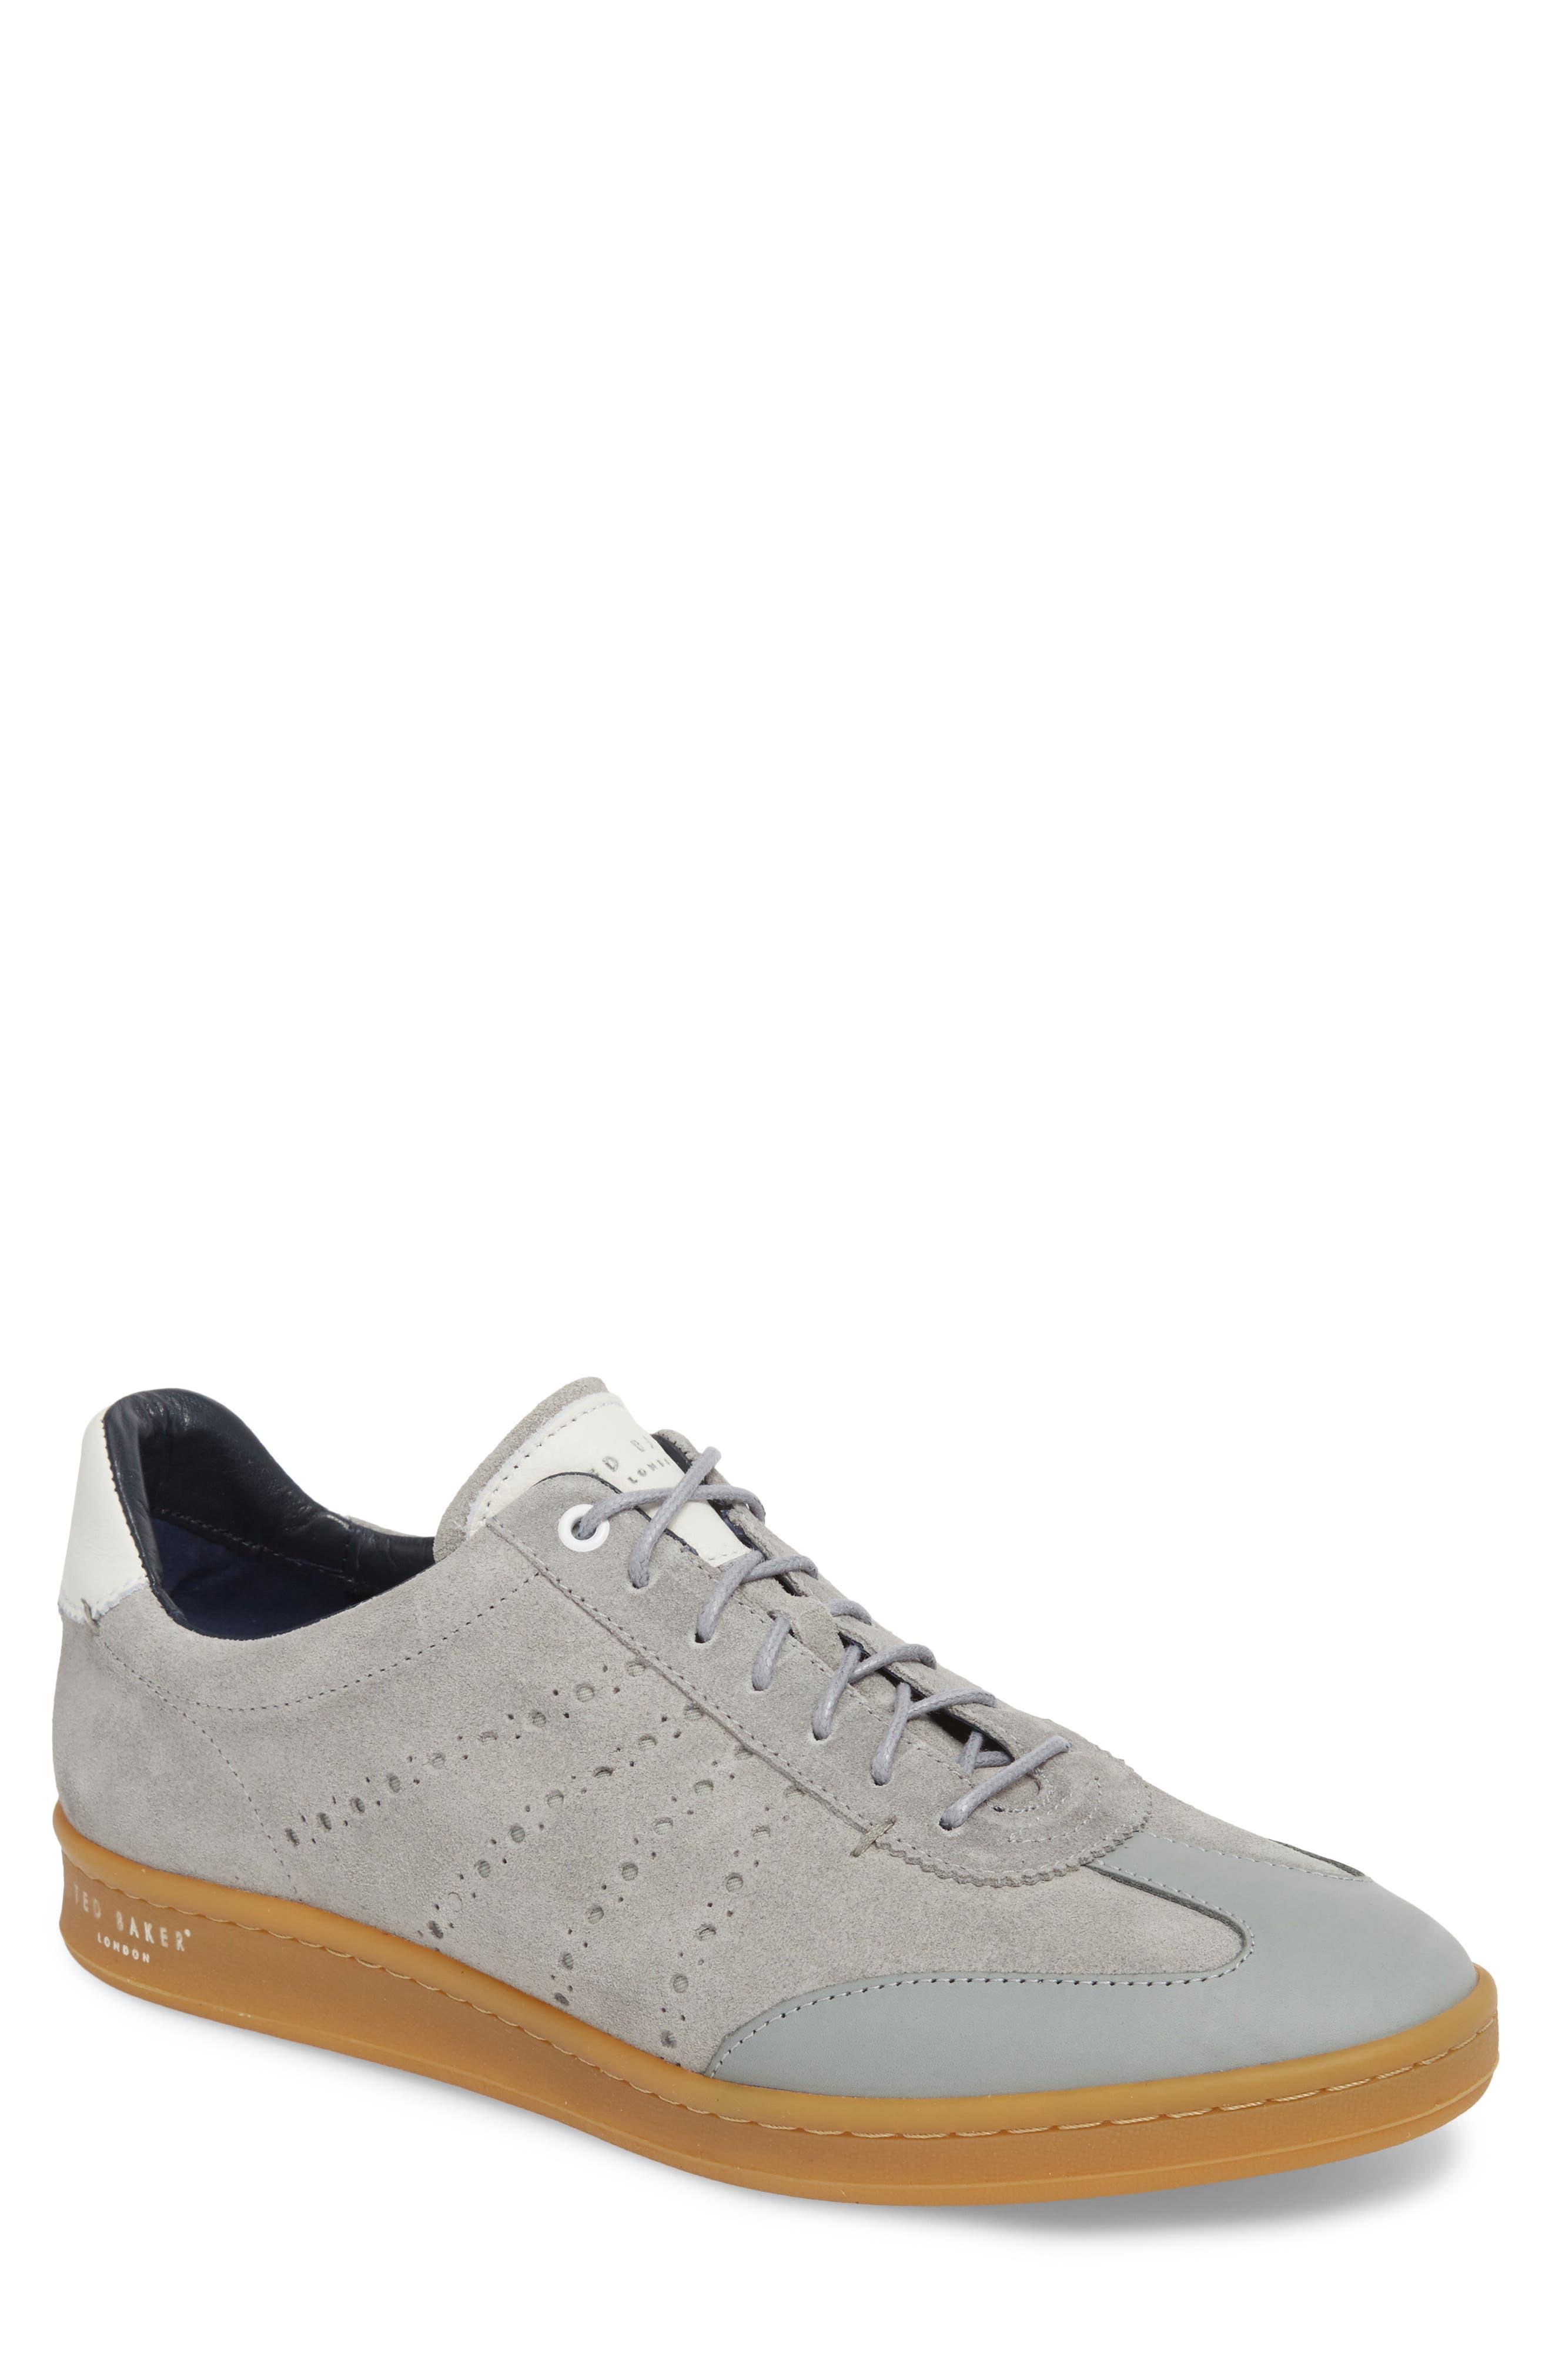 Orlees Low Top Sneaker,                         Main,                         color,